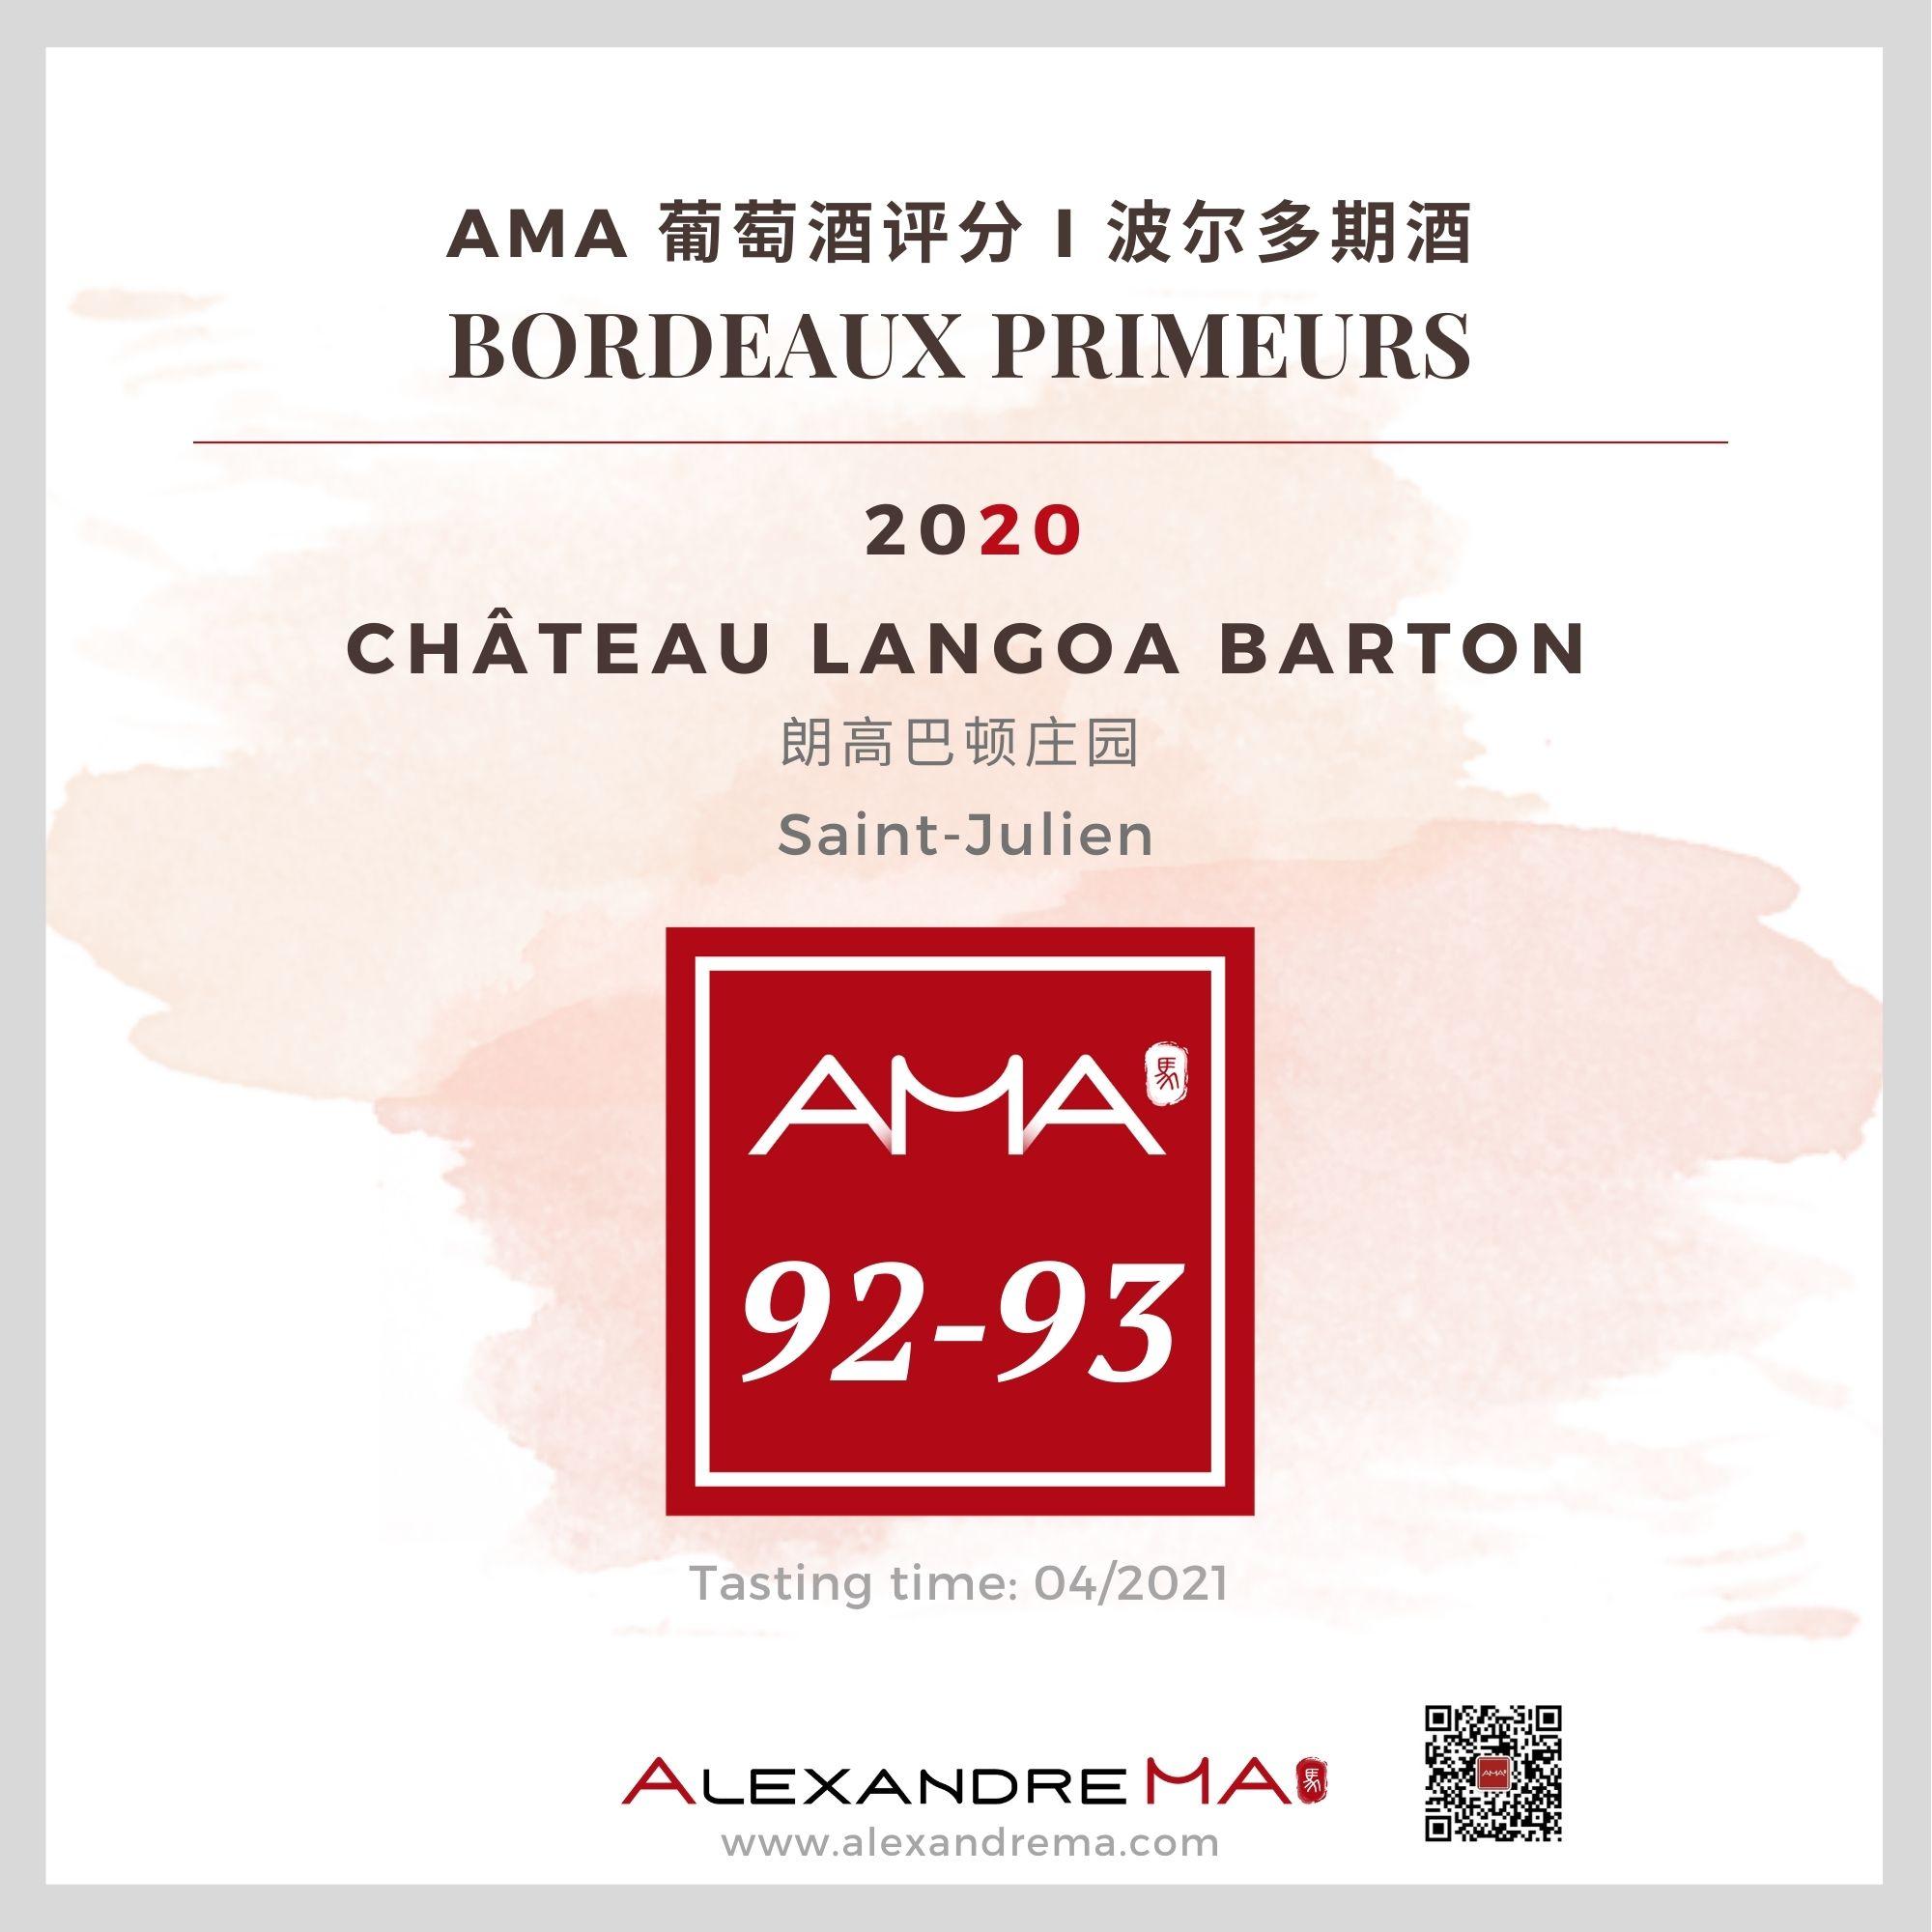 Château Langoa Barton 2020 - Alexandre MA